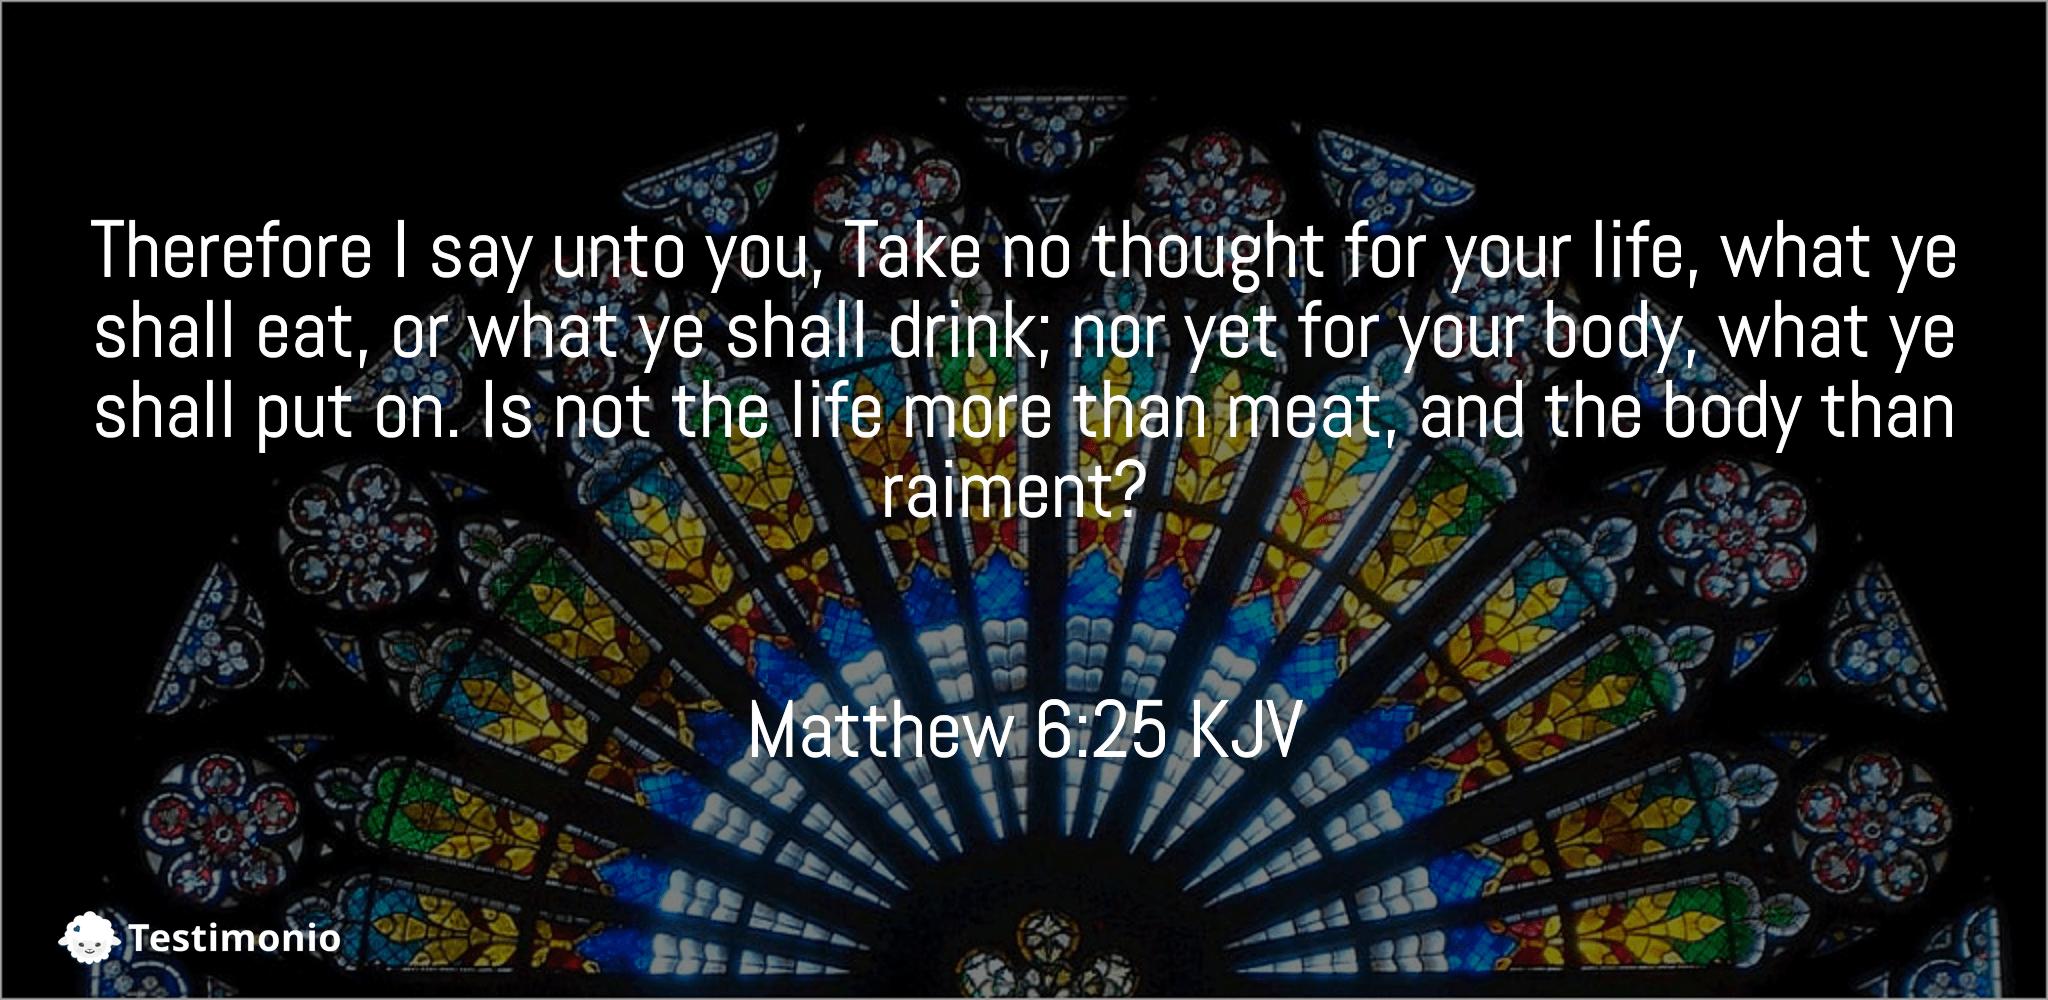 Matthew 6:25